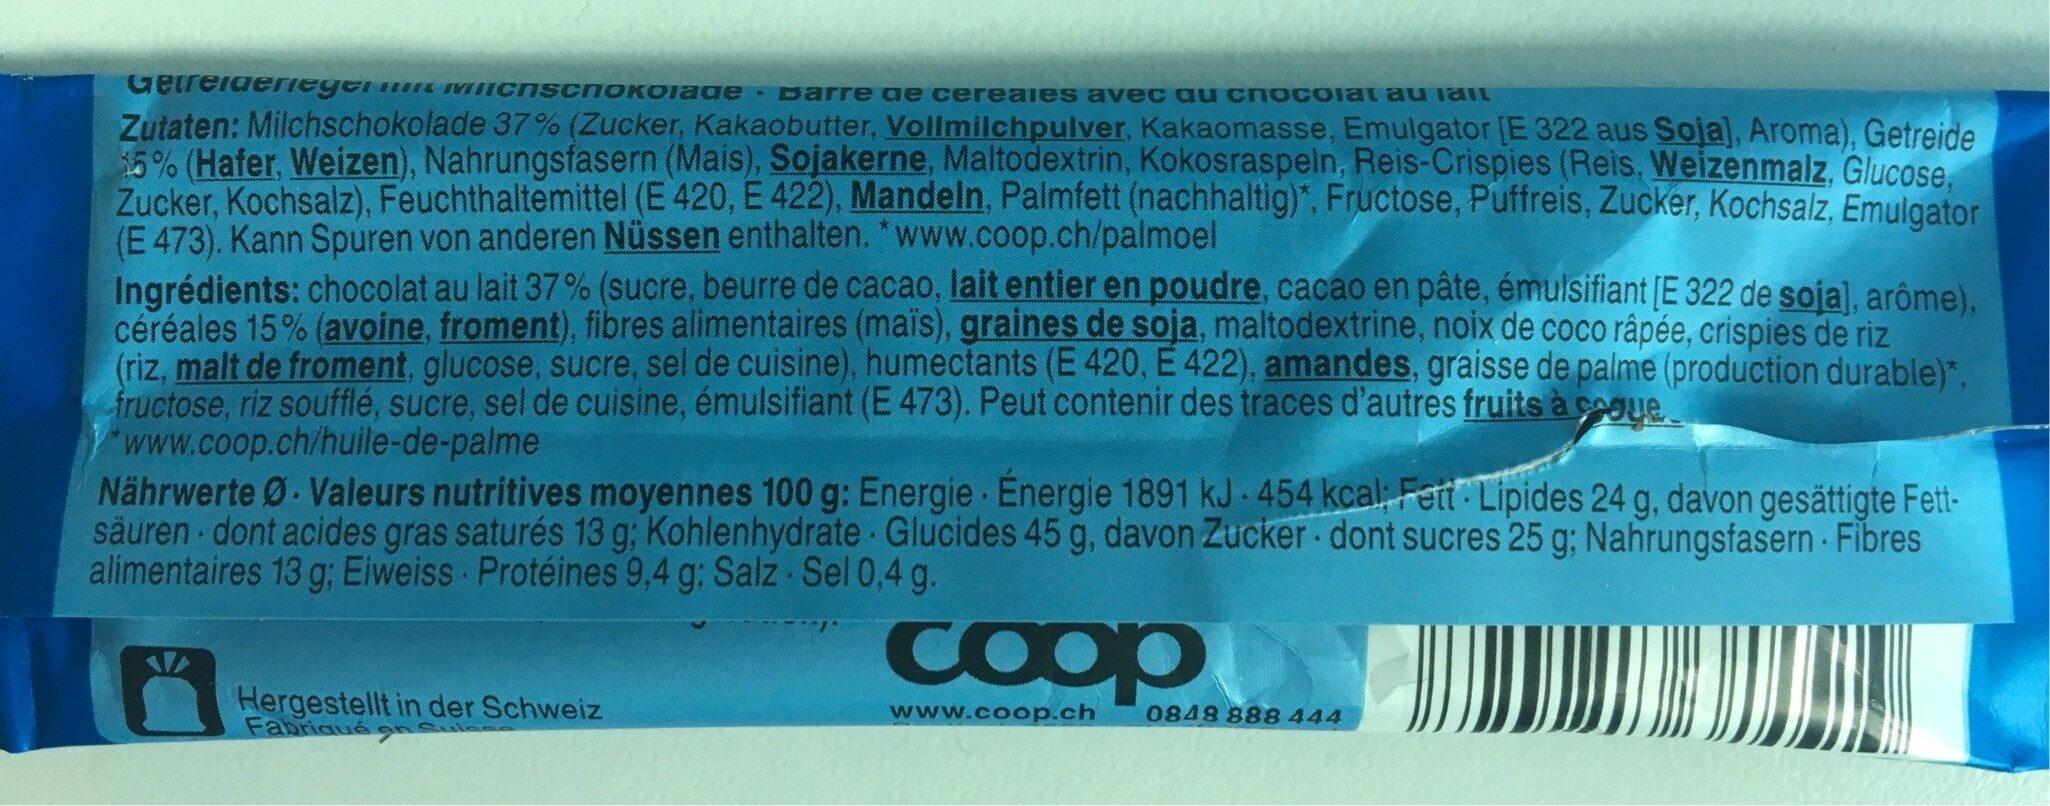 Country Soft Snack - Milk Chocolate Bar - Ingrediënten - fr